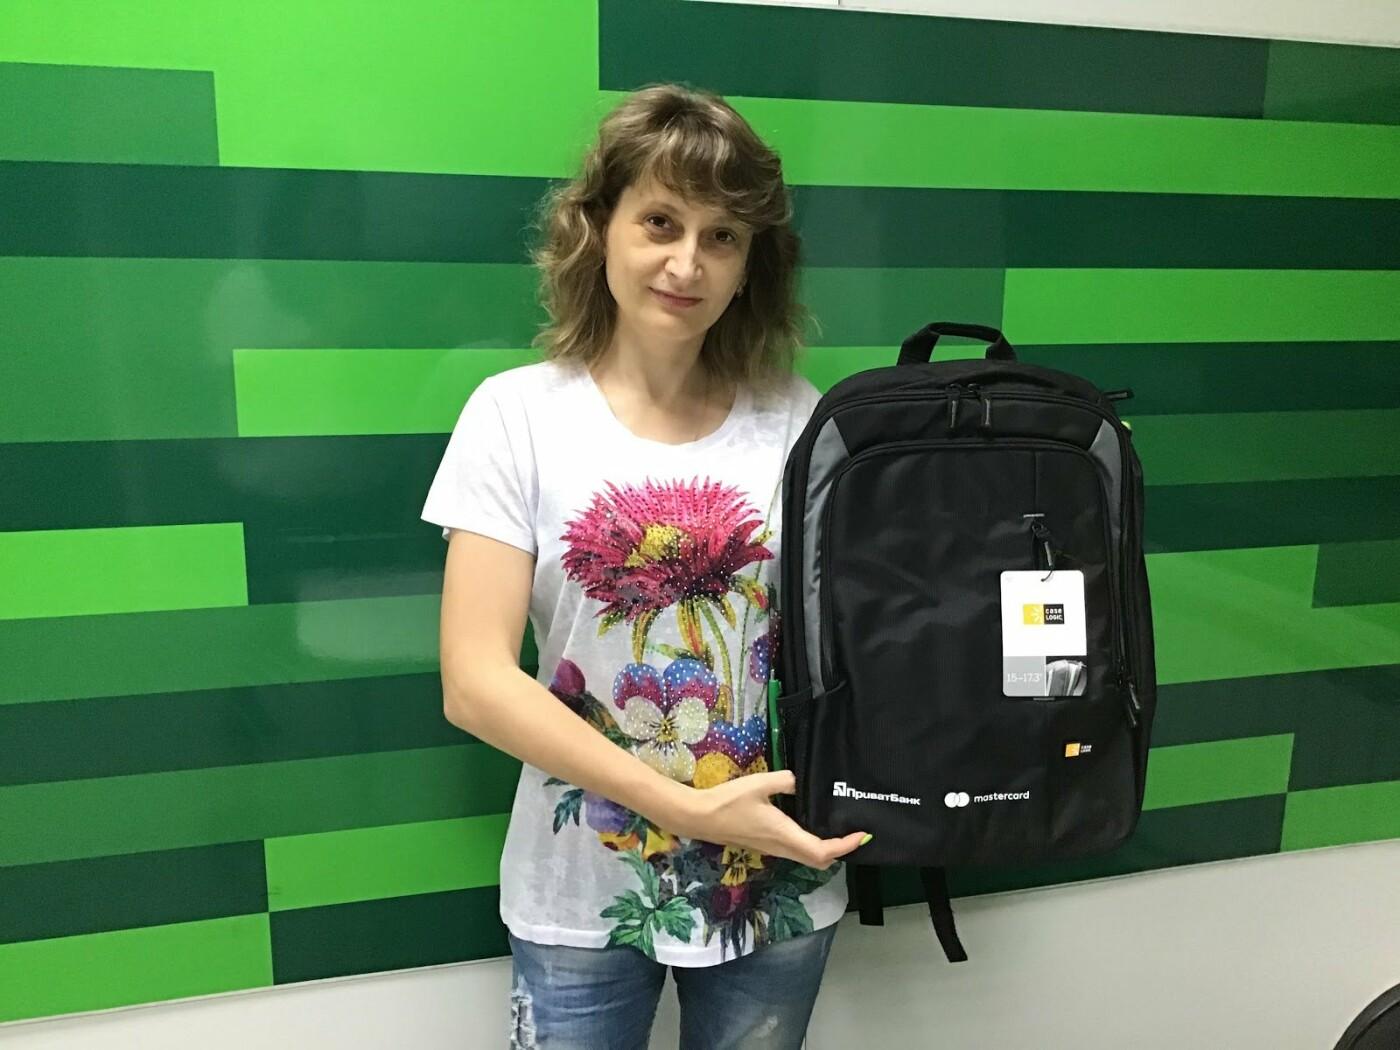 Хмельничанка перемогла в акції ПриватБанку з TransferGo, фото-1